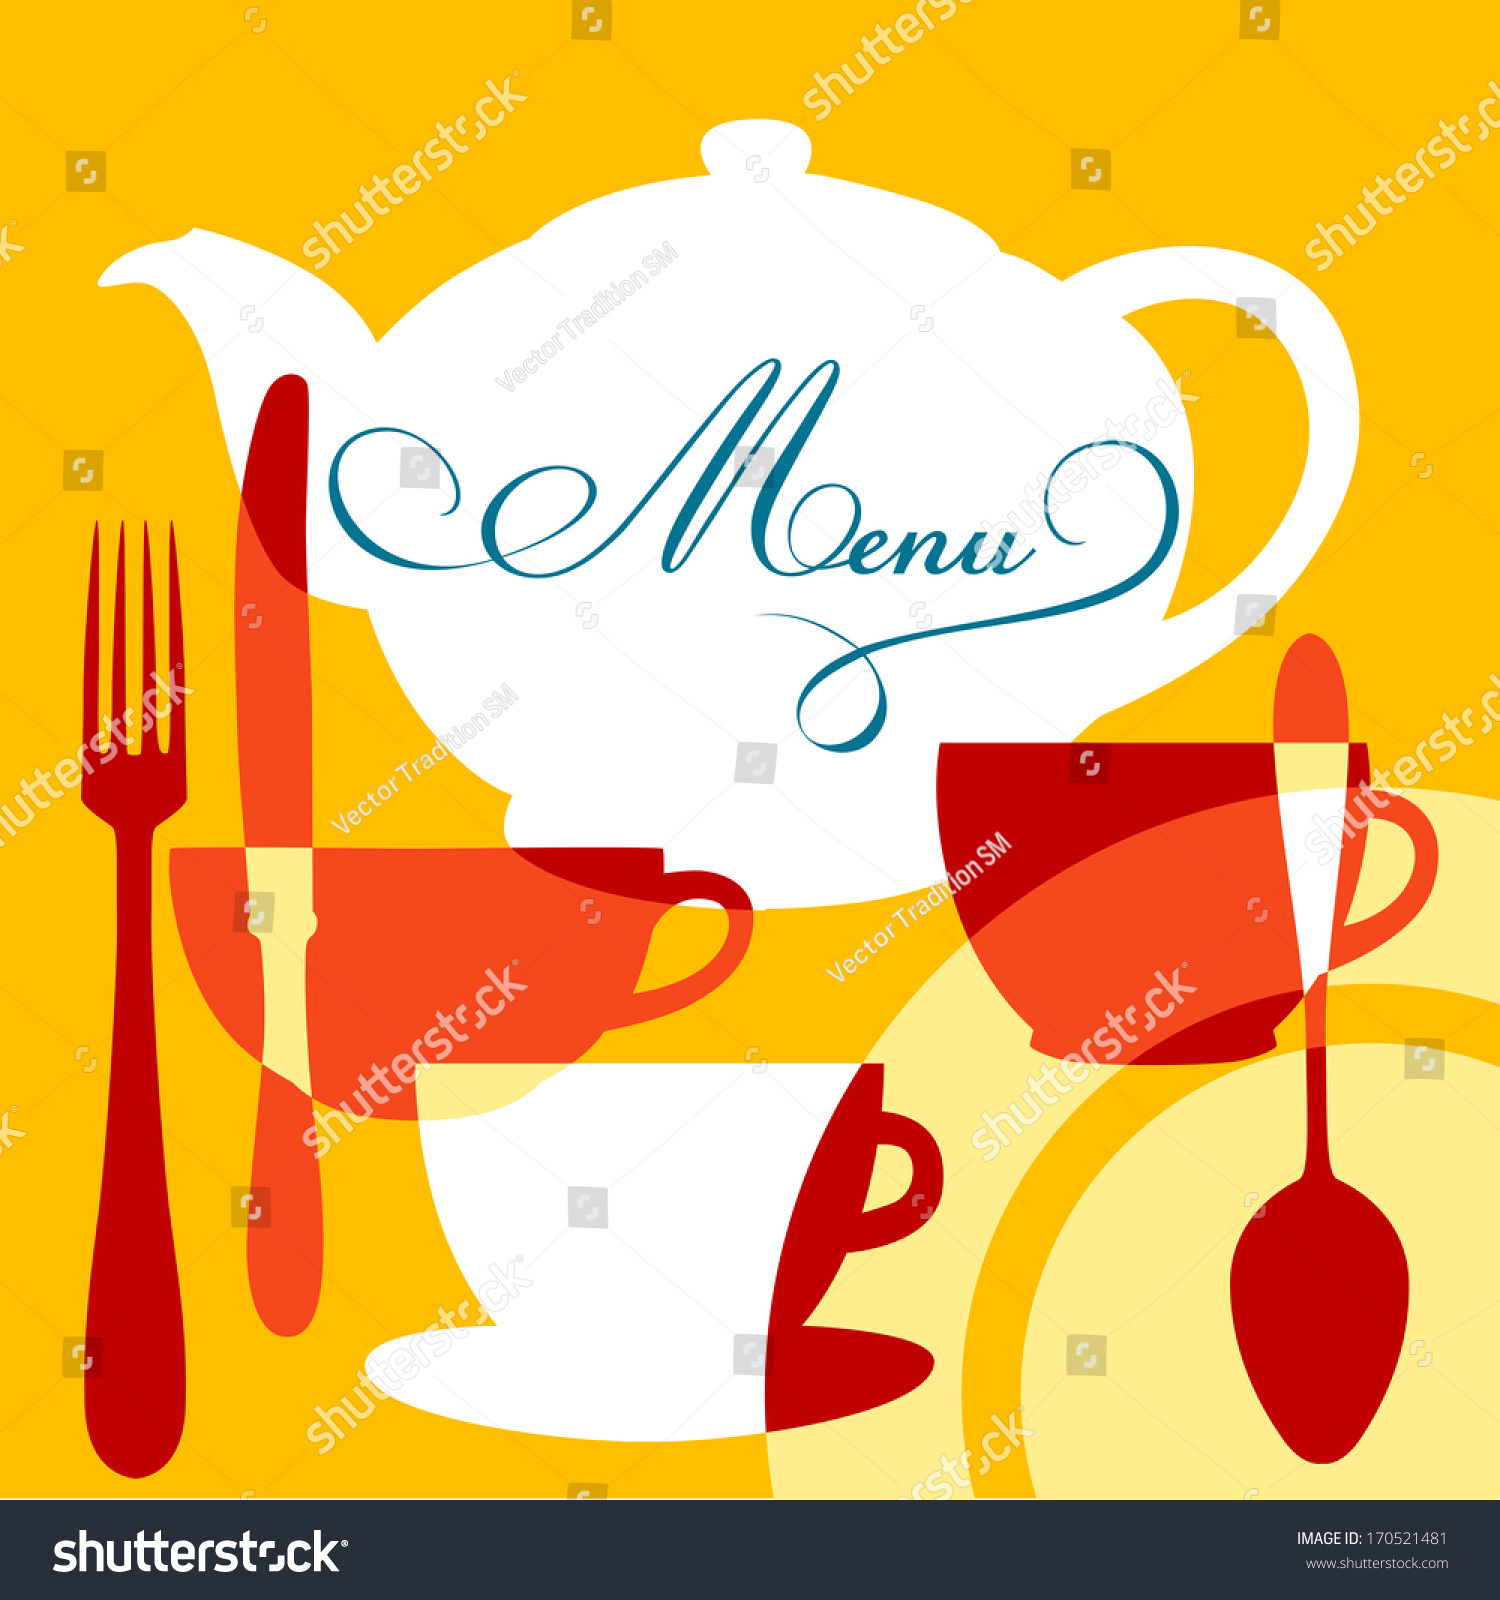 restaurant cafe menu cover design vector stock illustration